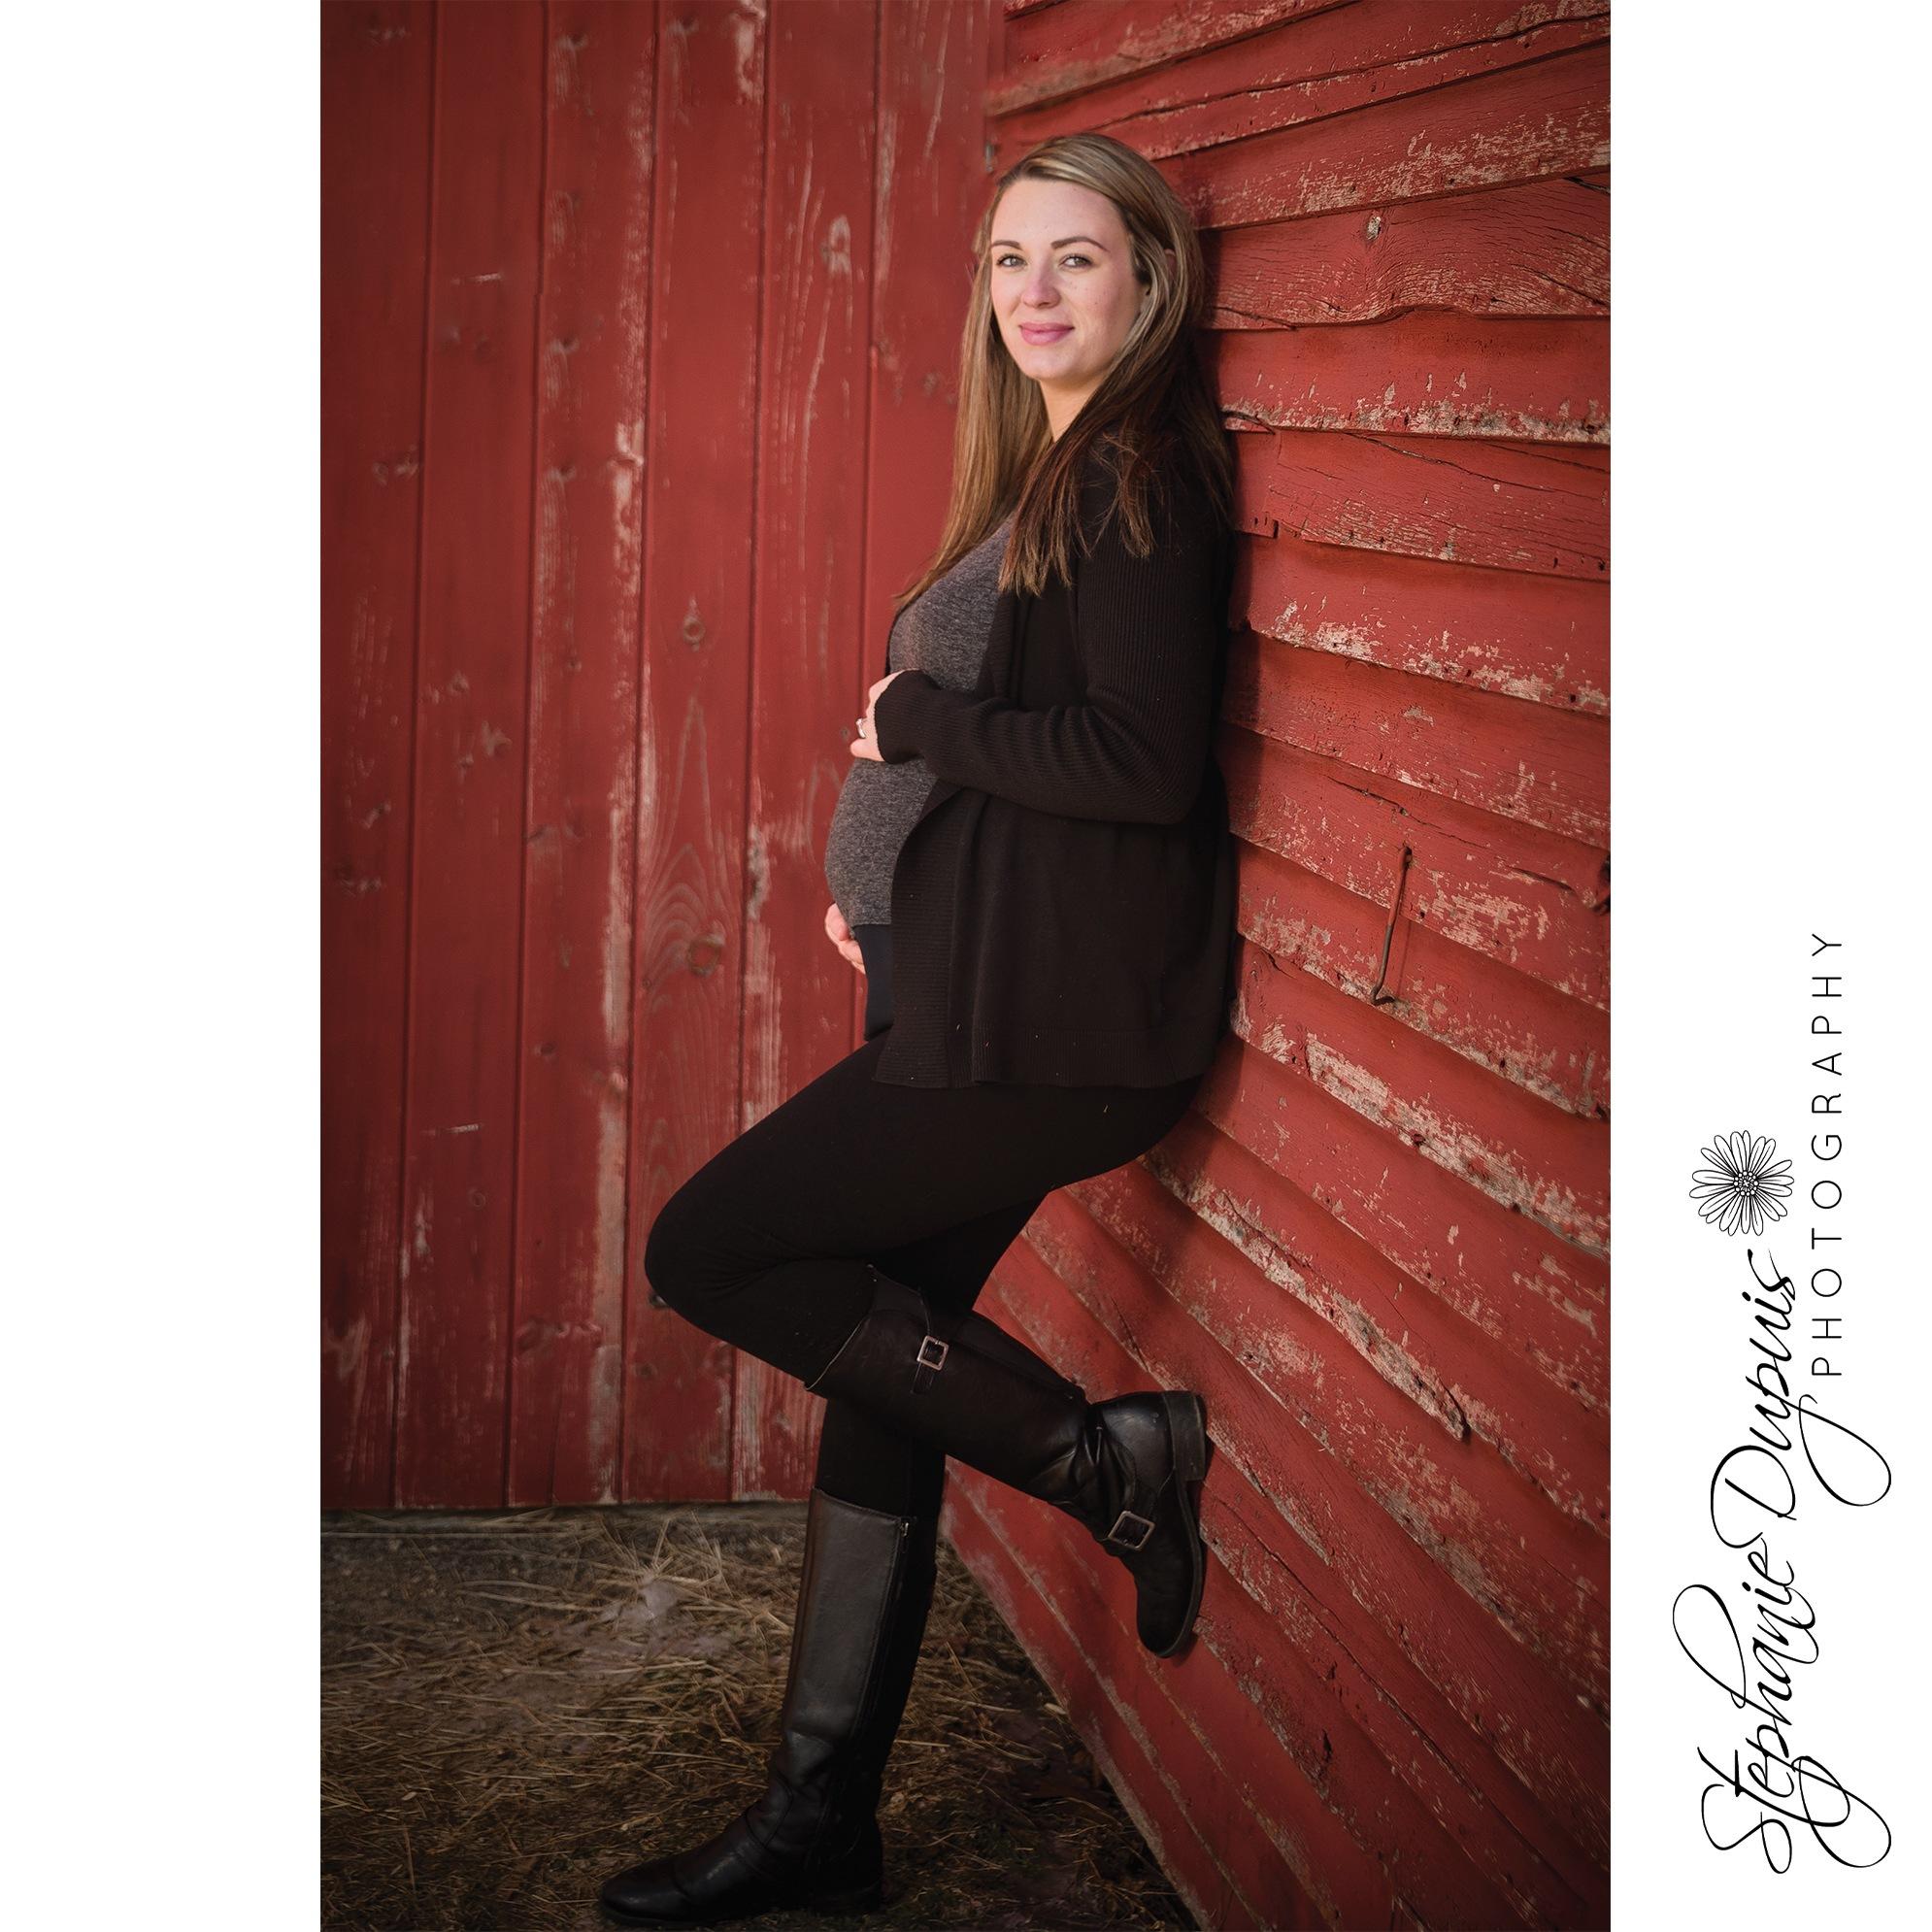 Keara Esposito Pregnancy 15 1 - Portfolio: Keara - Maternity Session